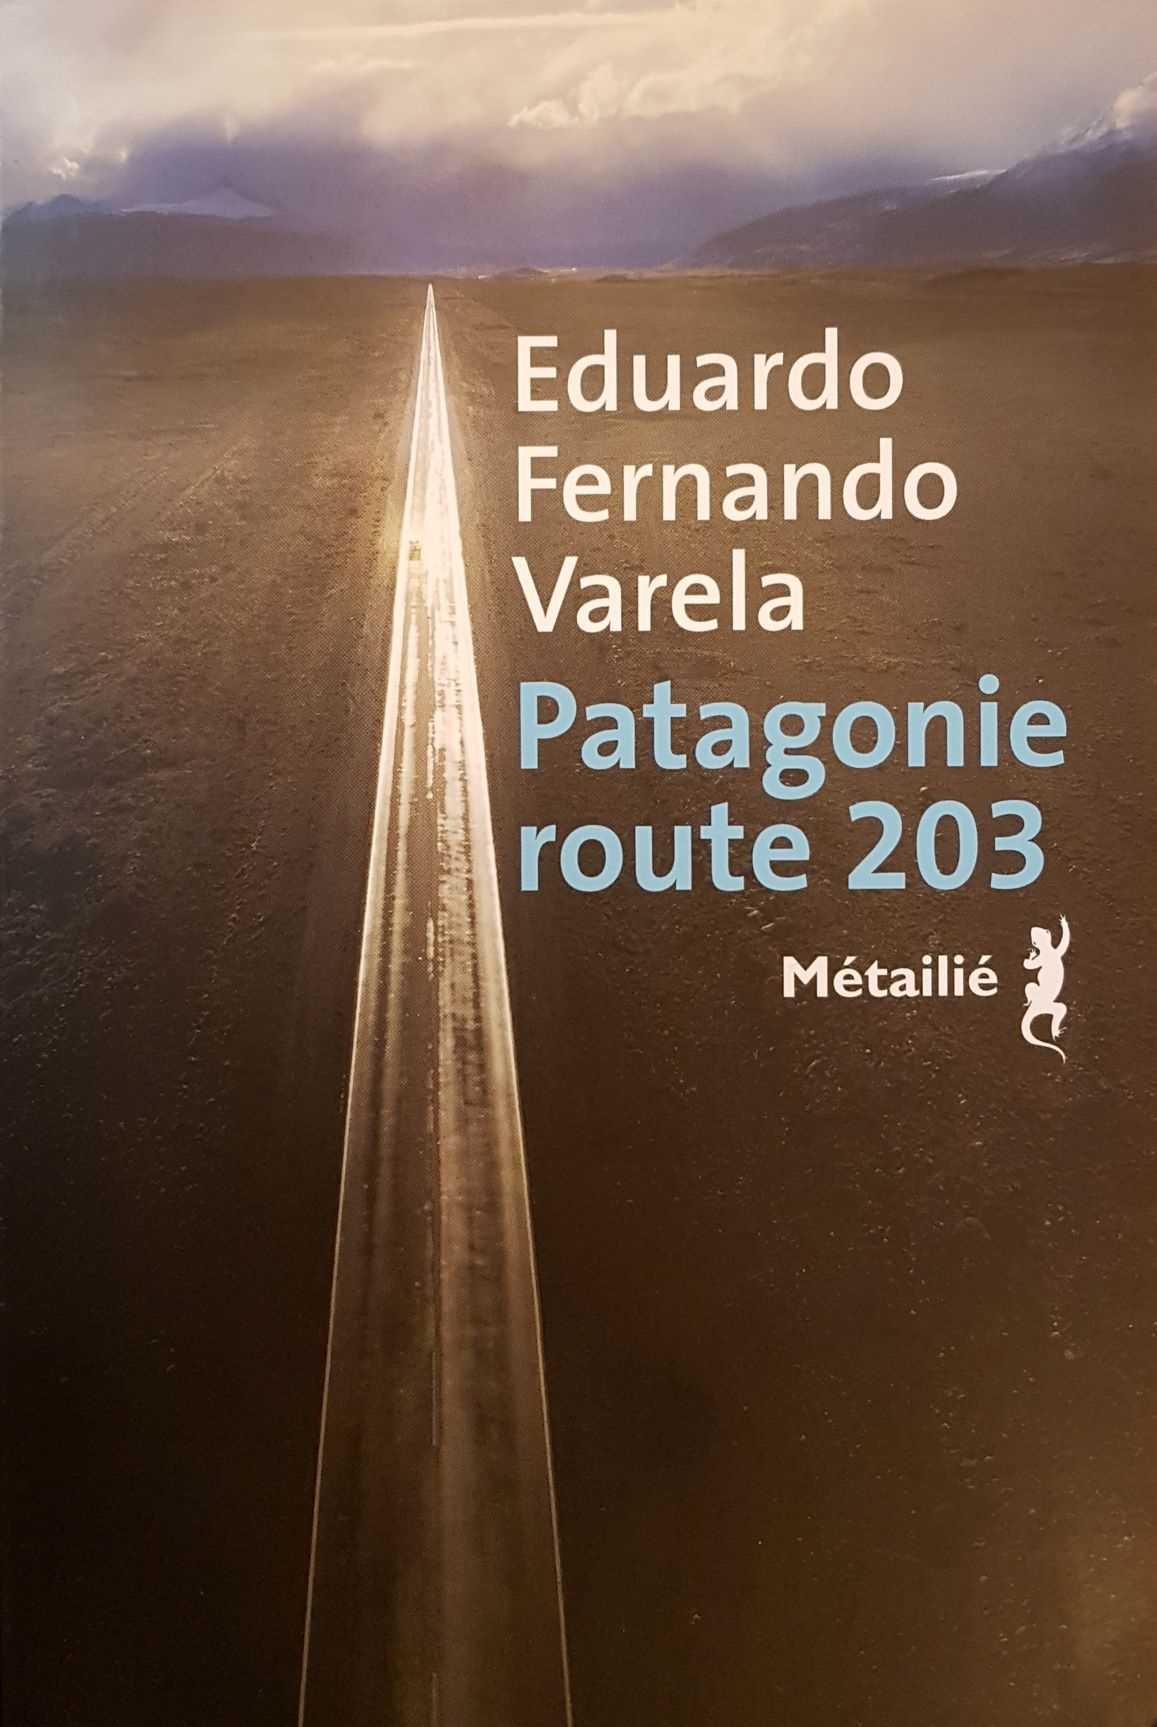 Librairie La Librai'bulles Patagonie route 203